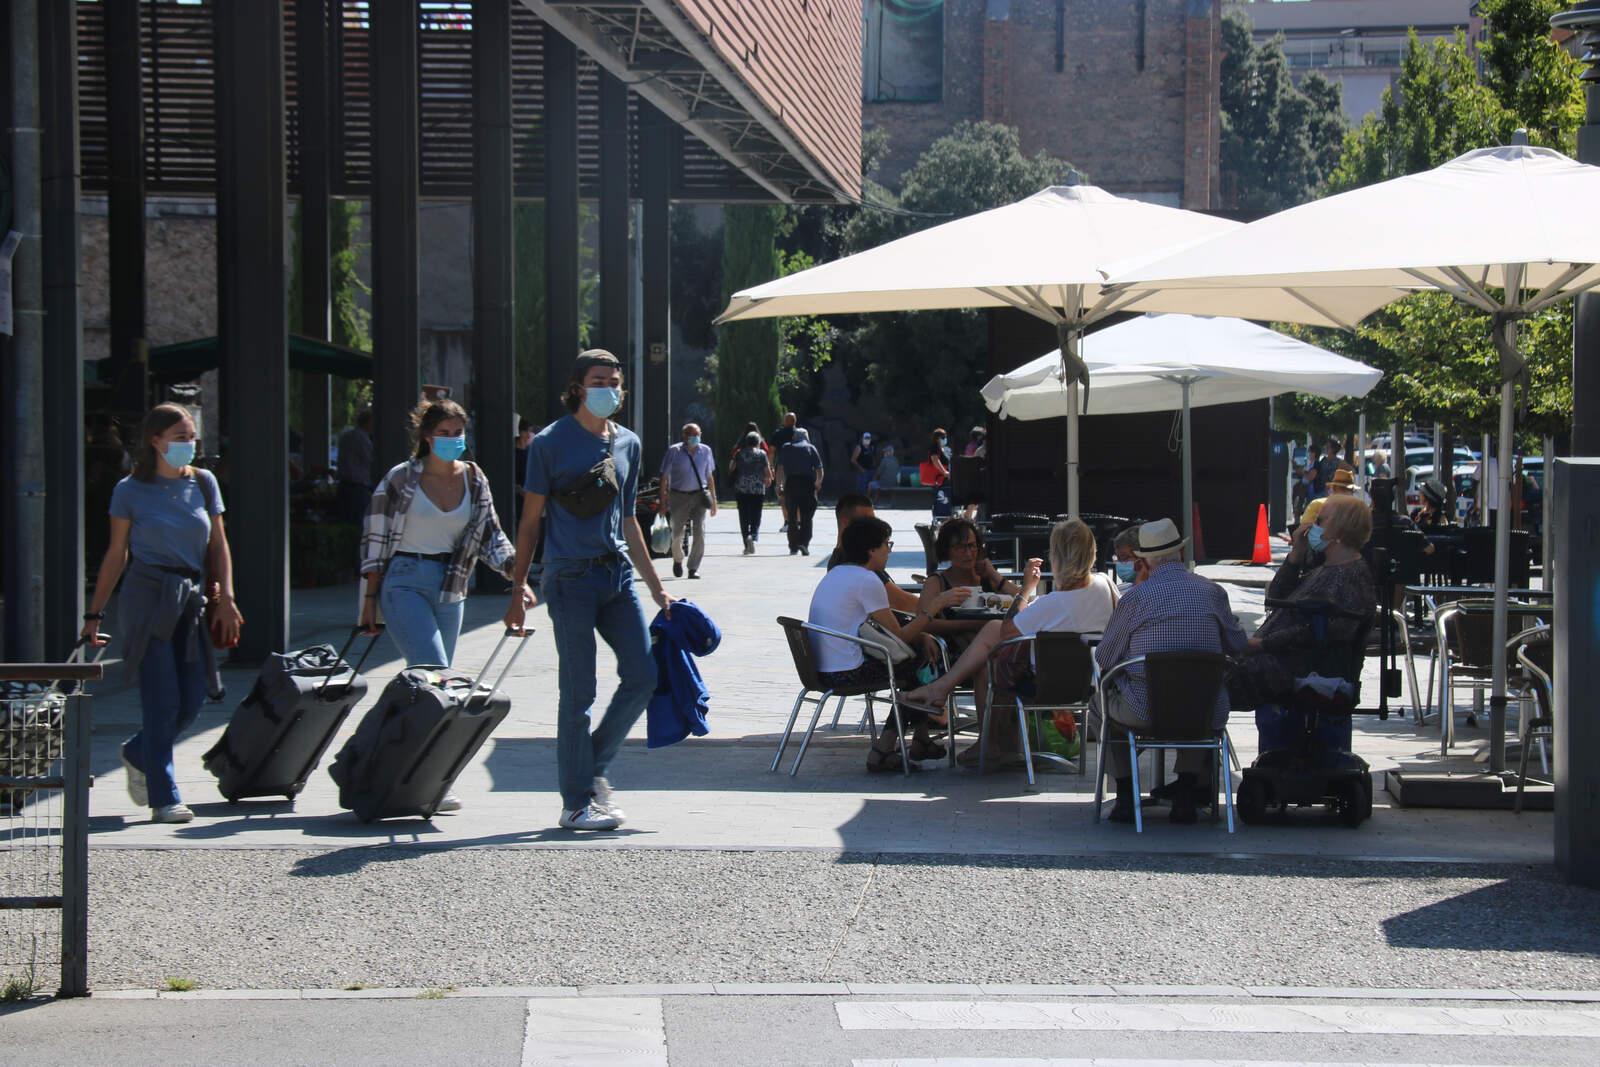 Turistes amb mascareta passant davant d'una terrassa